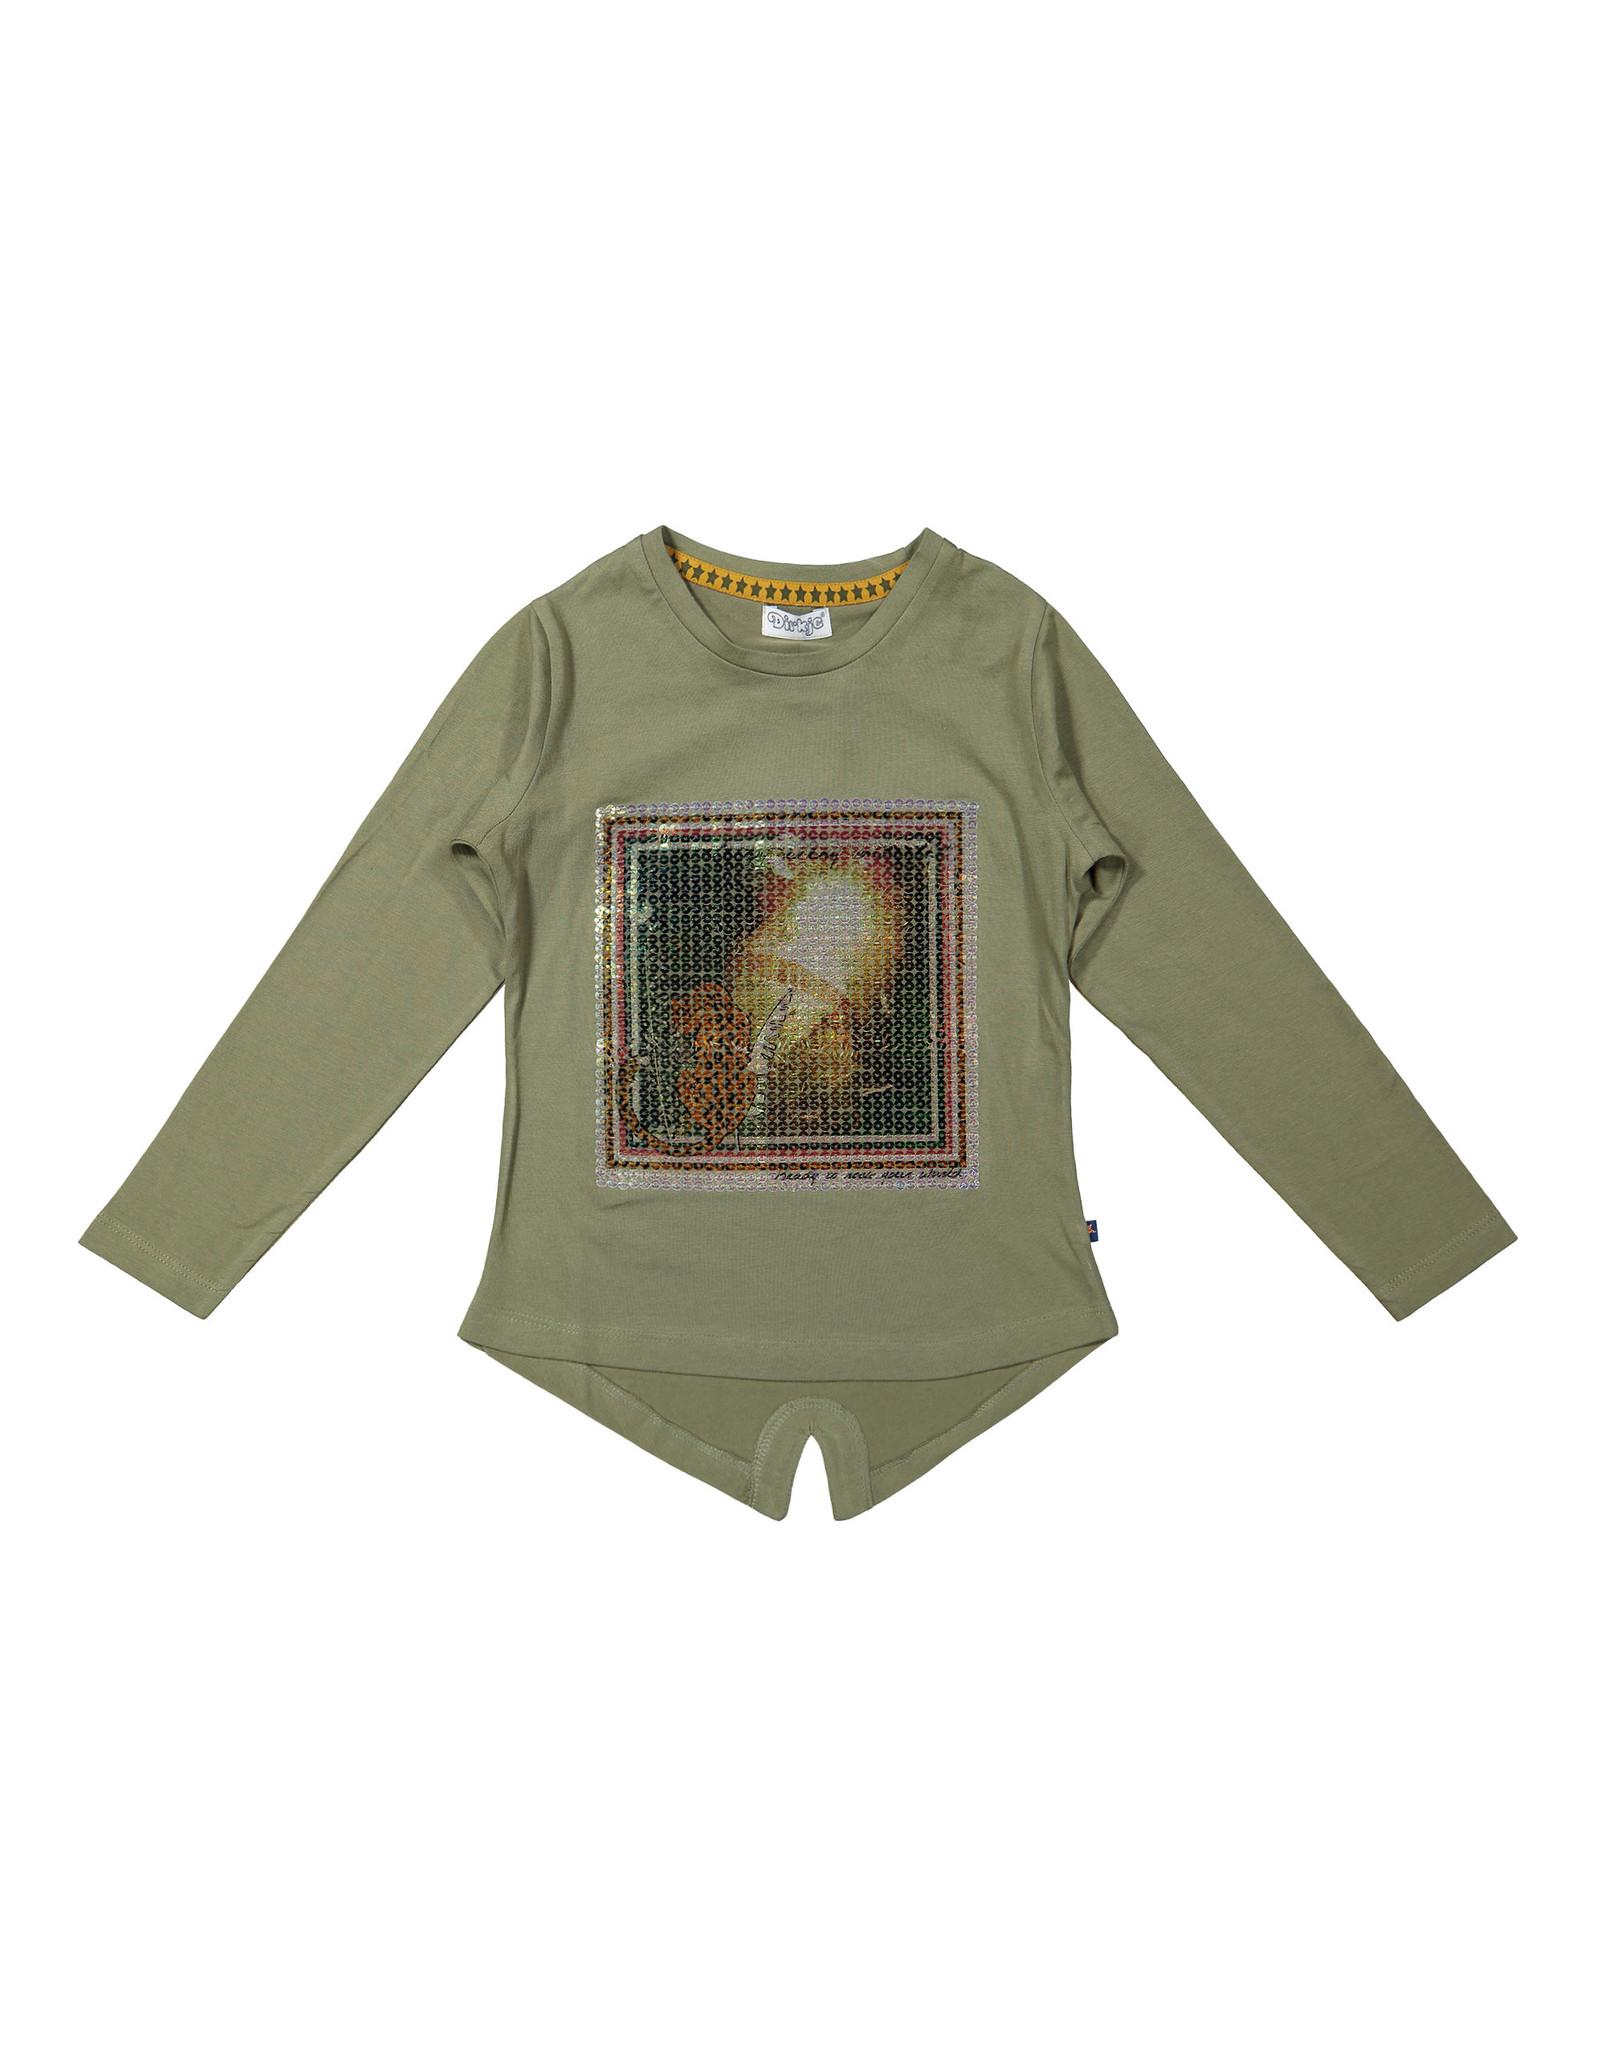 DJ Dutchjeans DJ Dutchjeans meisjes shirt paillet print Army Green